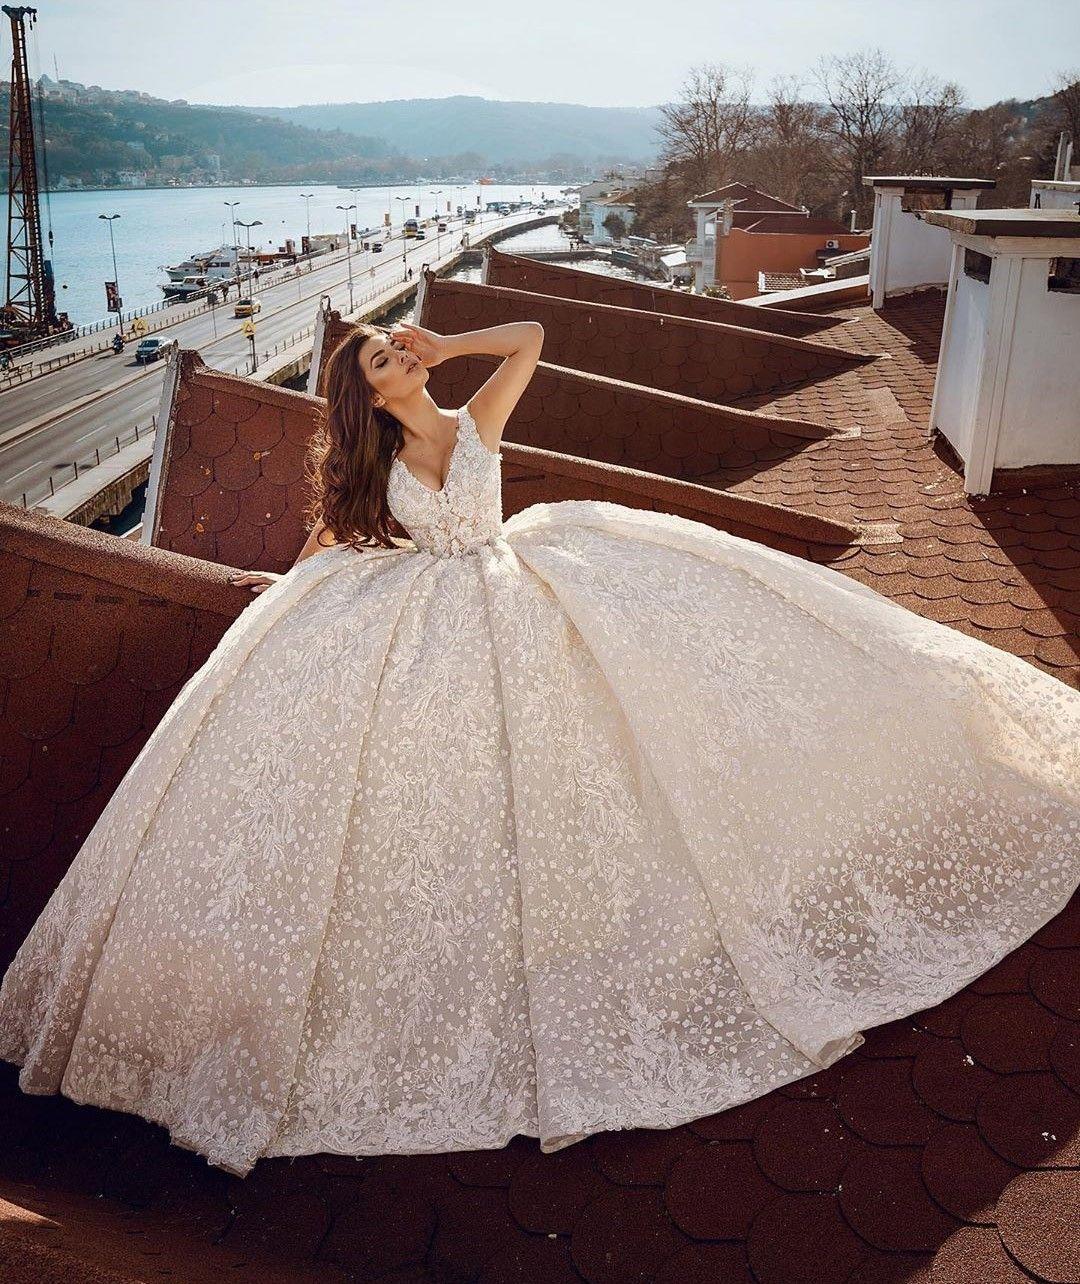 weddings #weddingday #weddingdress #bride #dress in 19